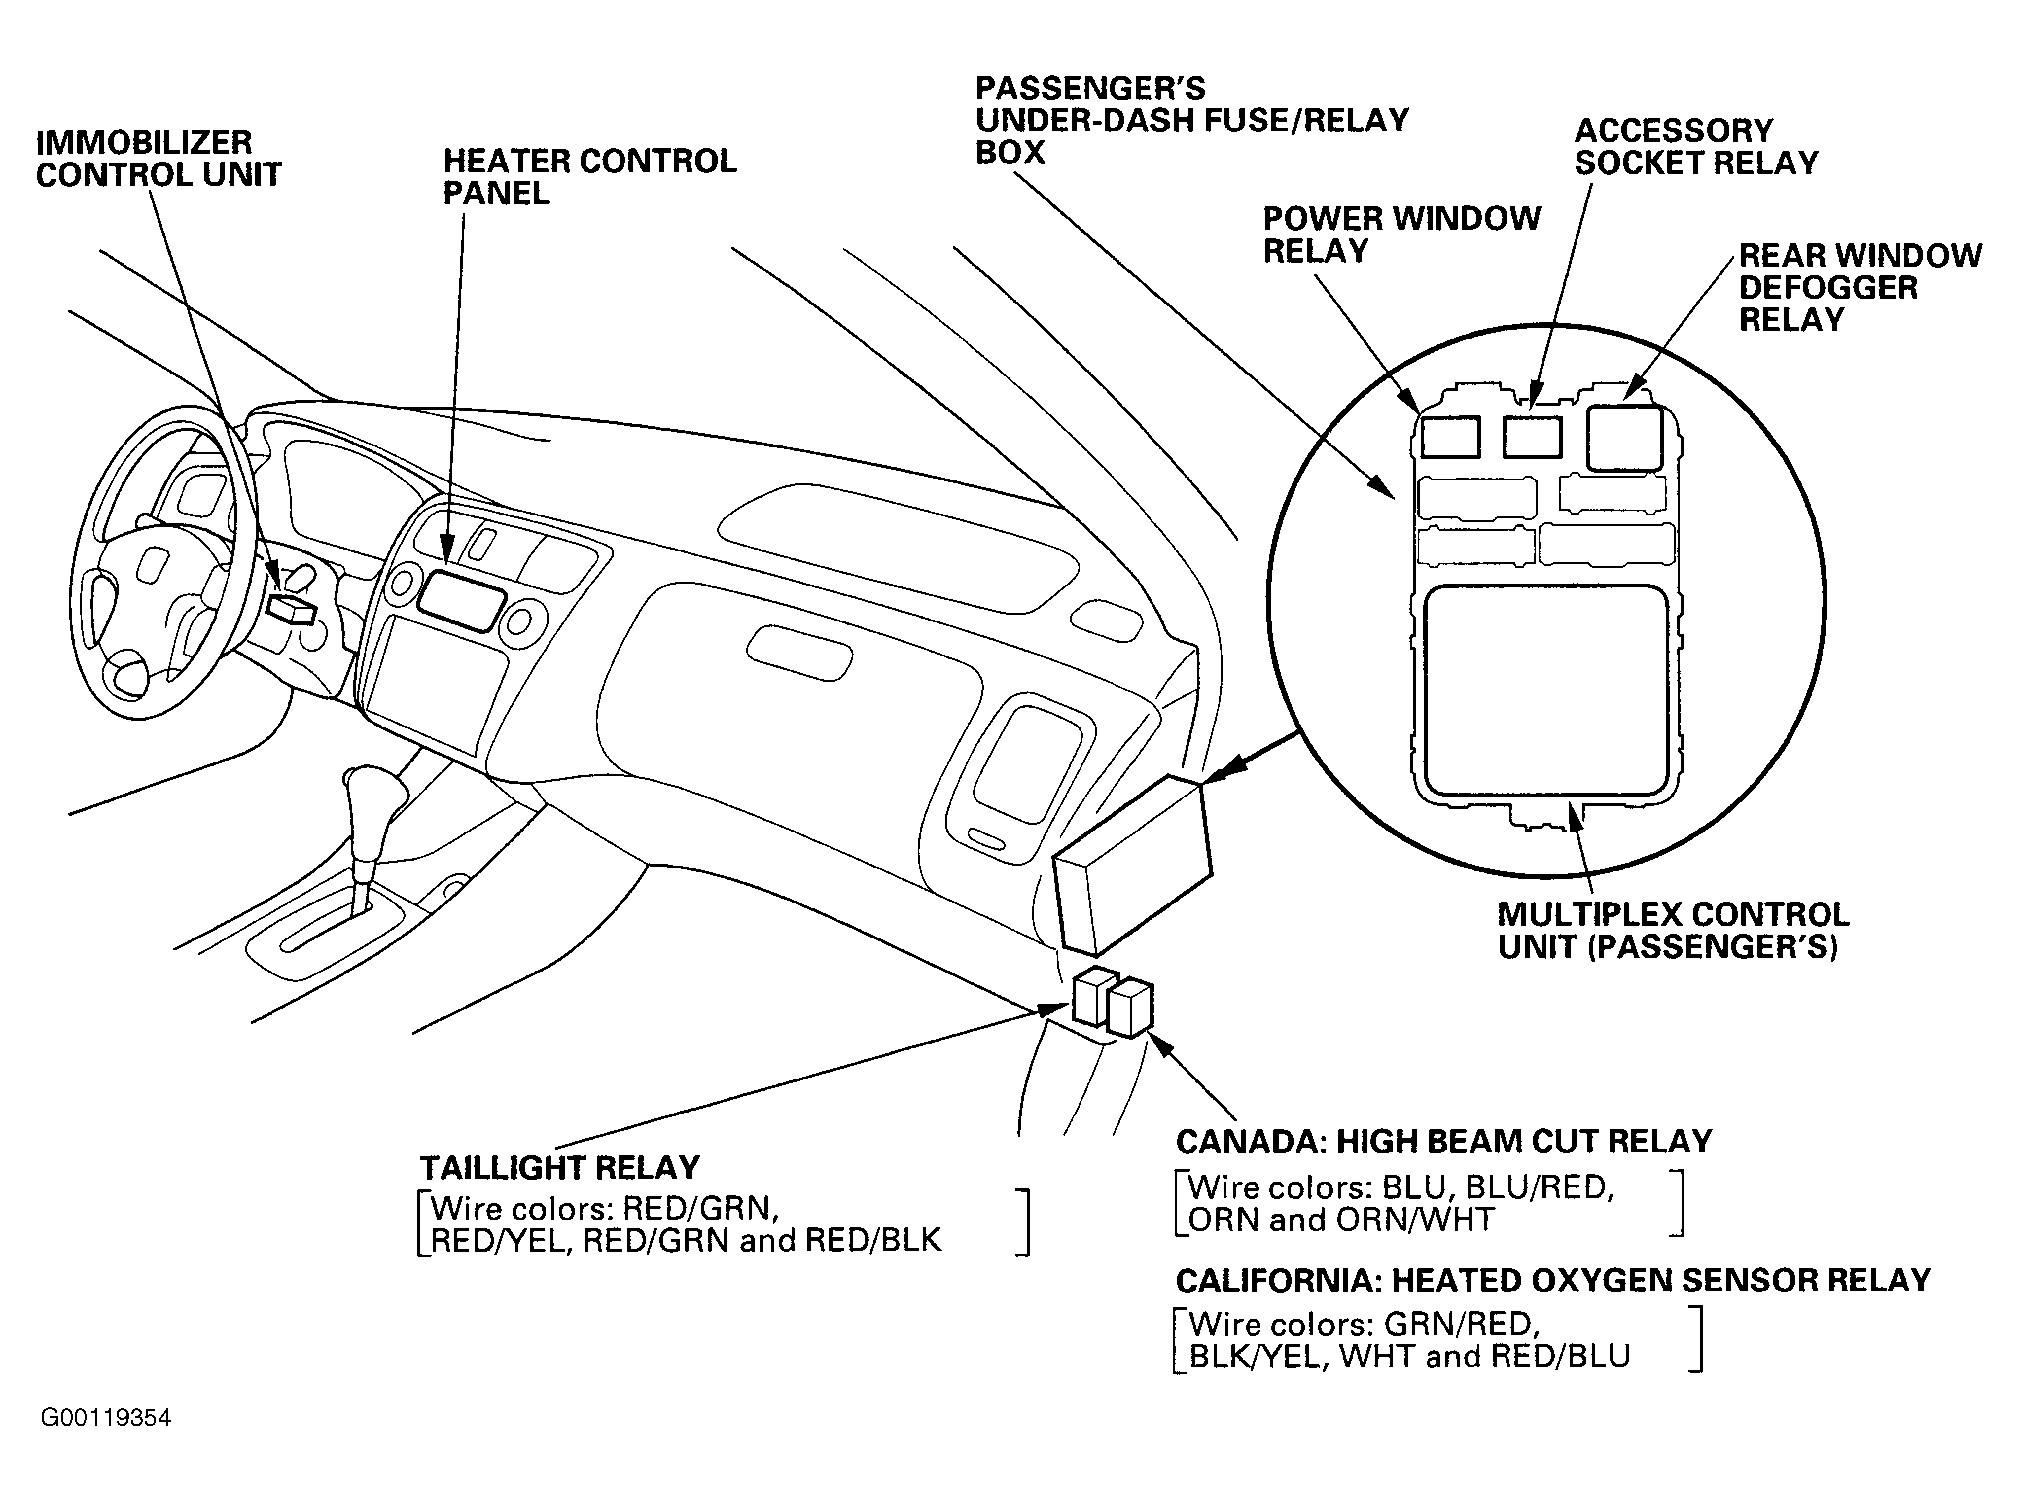 Incredible 1998 Honda Civic Engine Diagram Basic Electronics Wiring Diagram Wiring Cloud Onicaalyptbenolwigegmohammedshrineorg